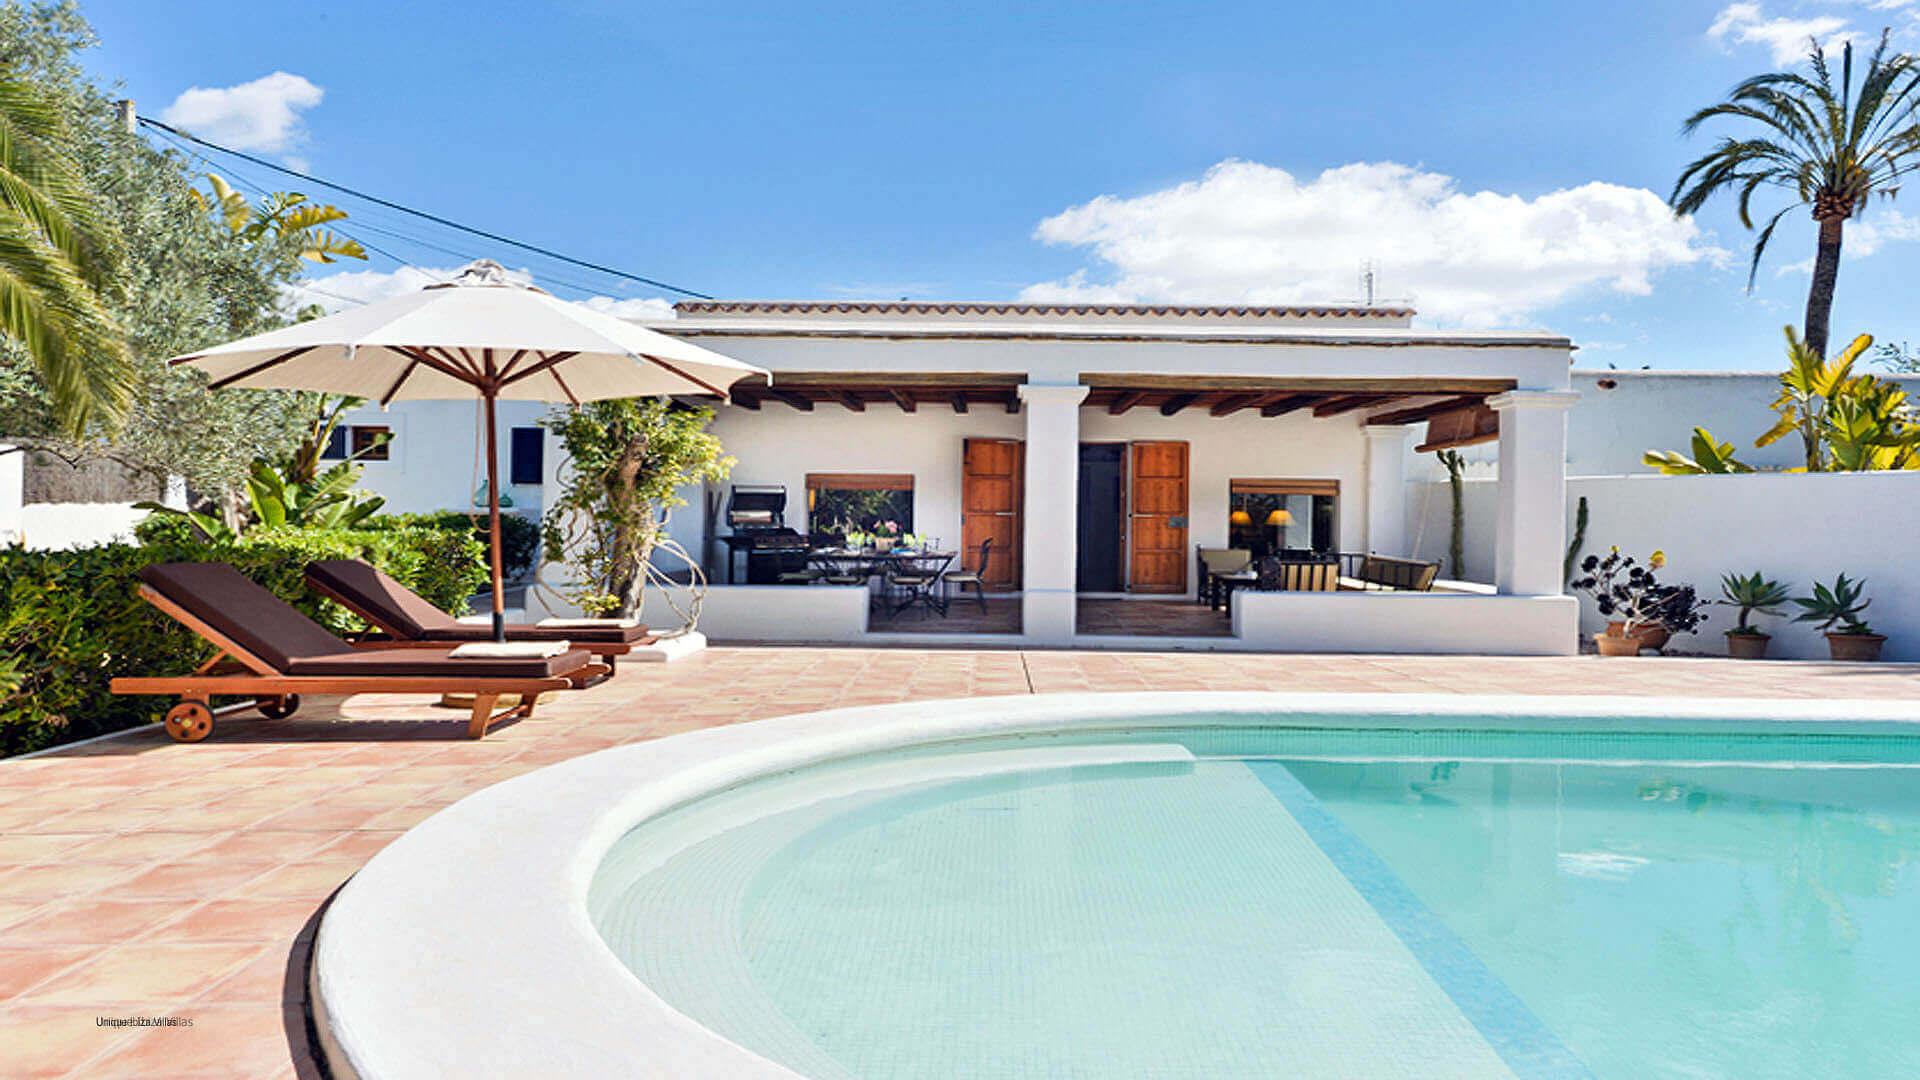 Villa Jaume Dalt Ibiza 1 Playa Den Bossa